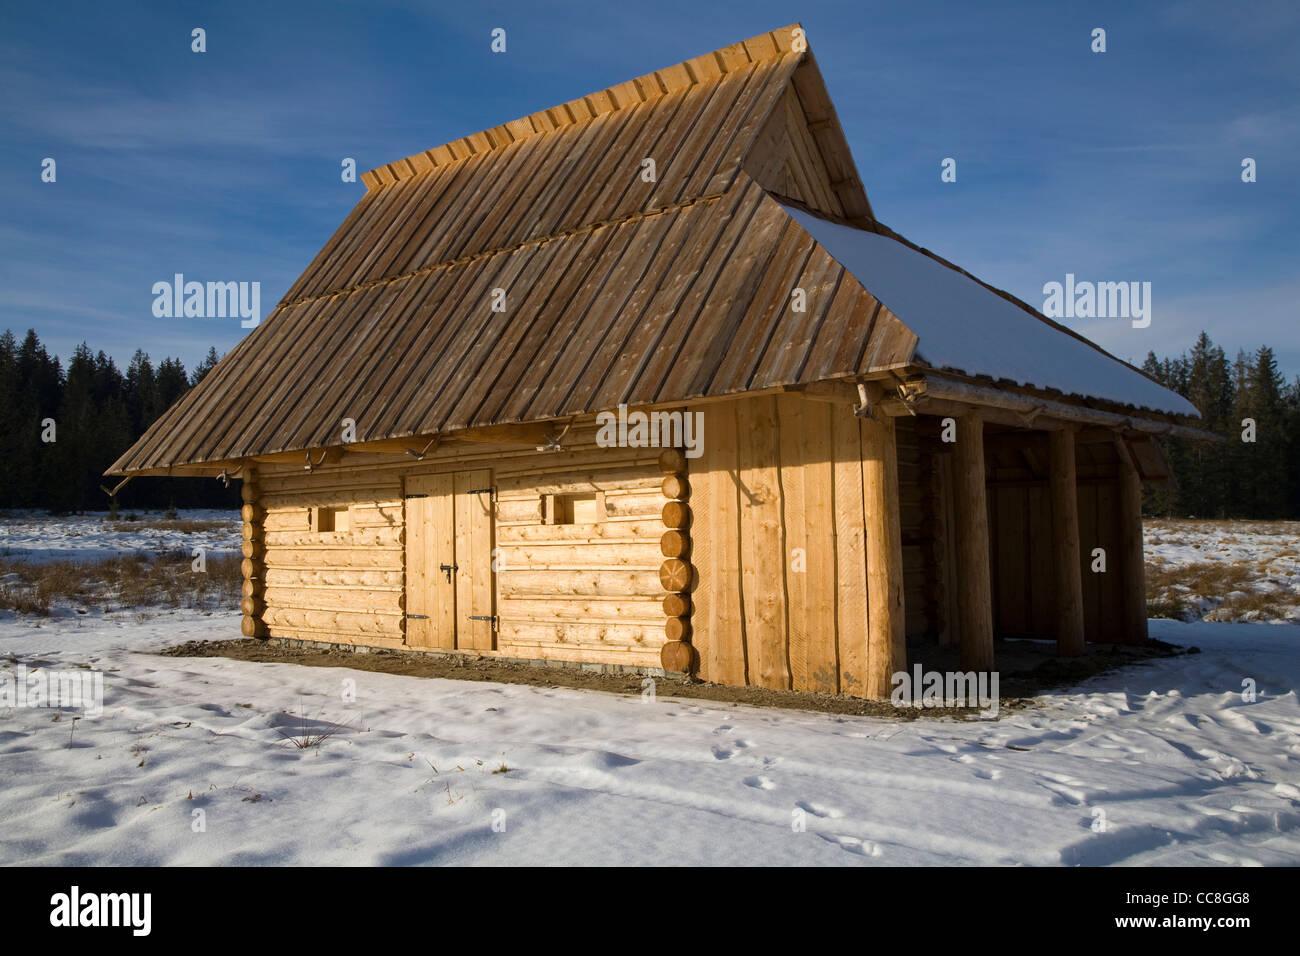 Traditional Stables for sheep, Tatra Mountains, Poland, Near, Zakopane, - Stock Image